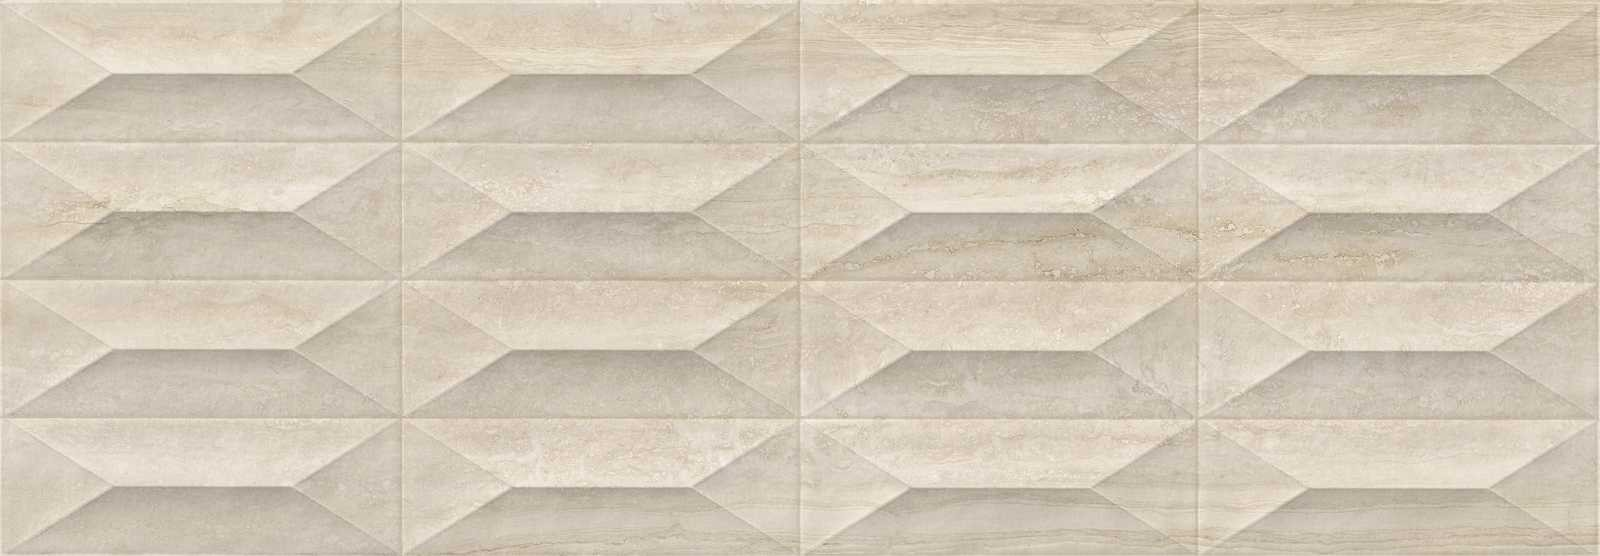 Стенни плочки Marbleplay Travertino Strutturato Gem 3D 30x90